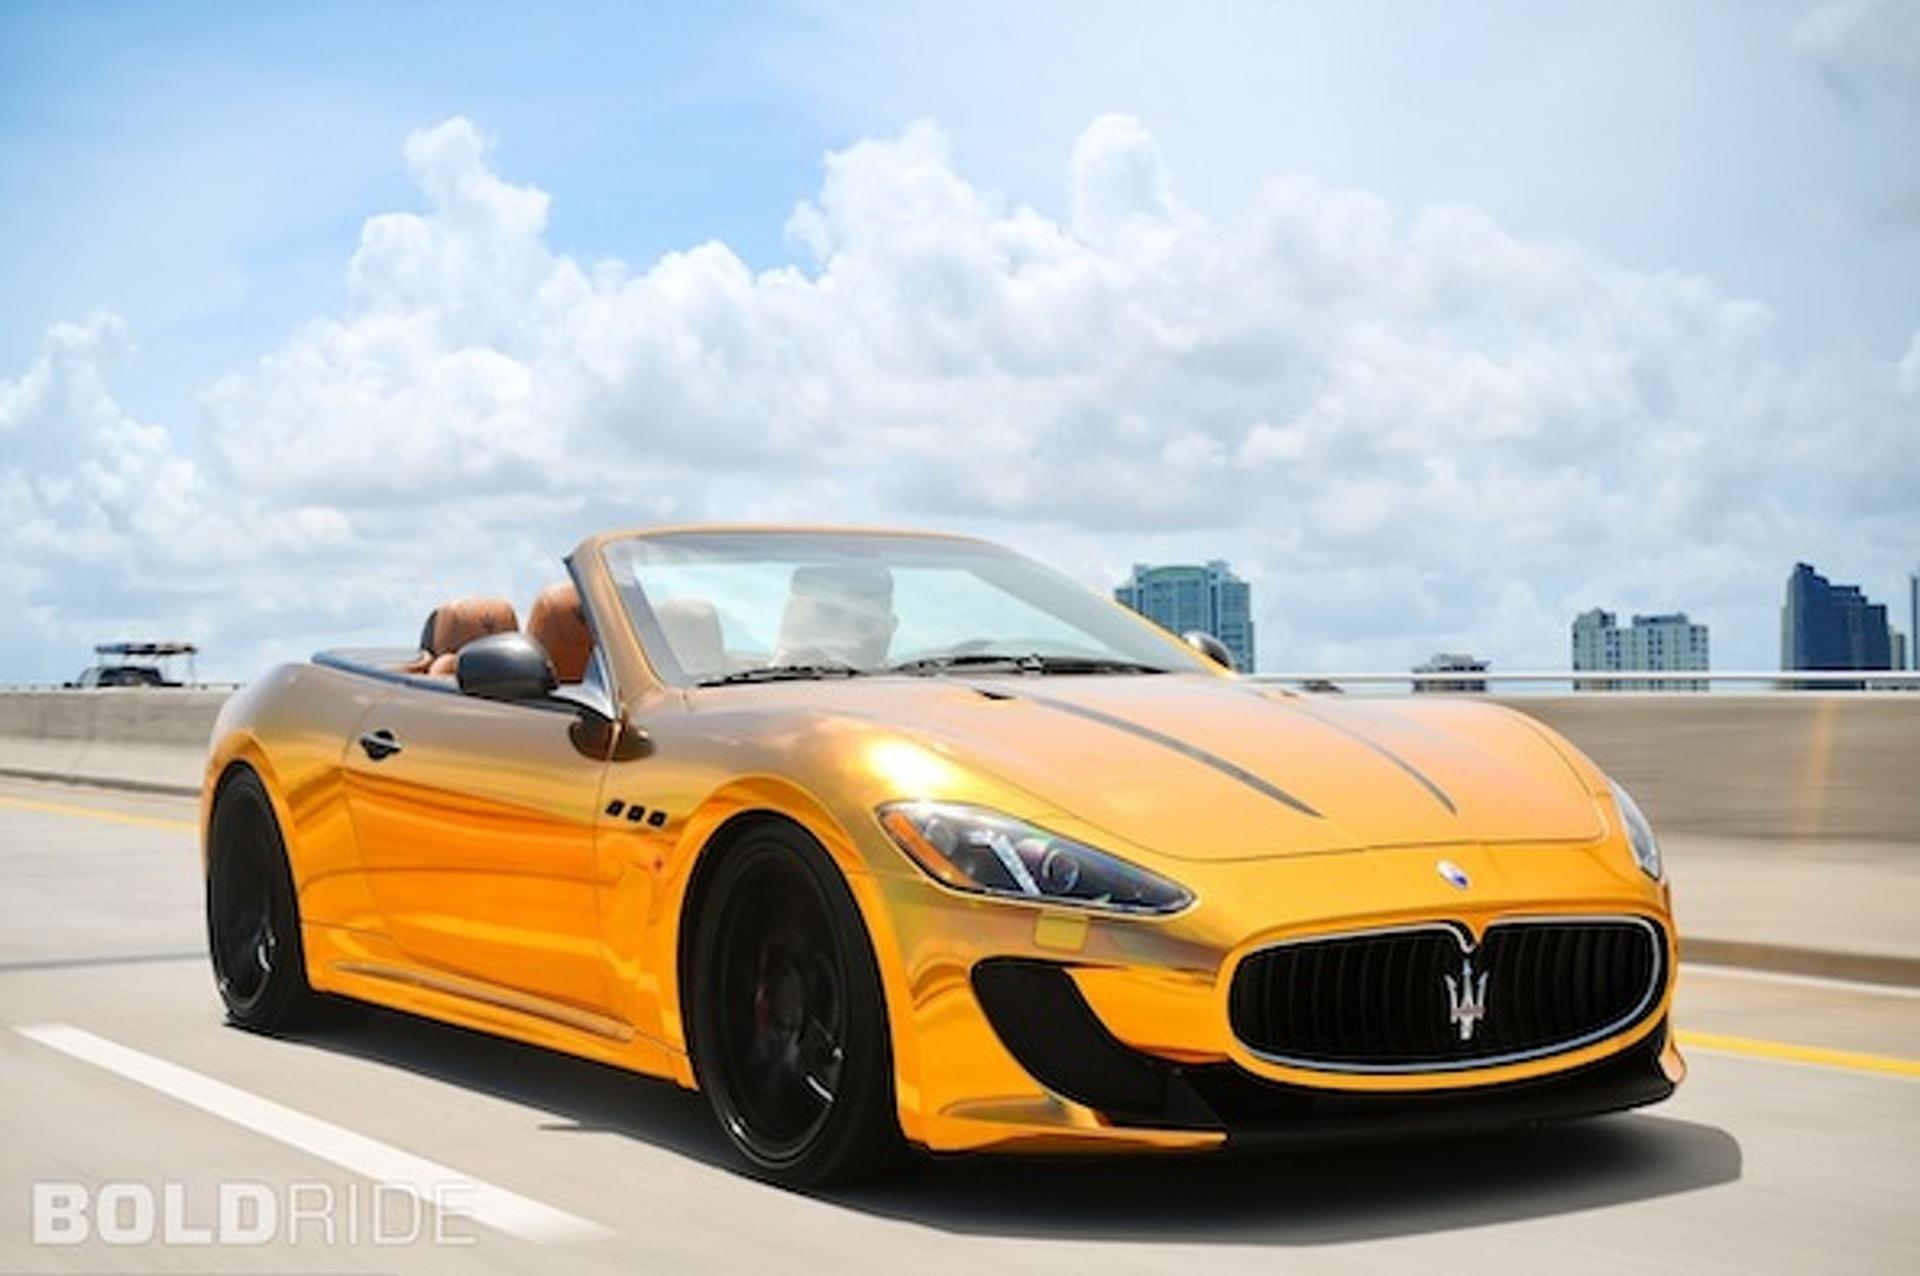 Gold Chrome Paint Cars